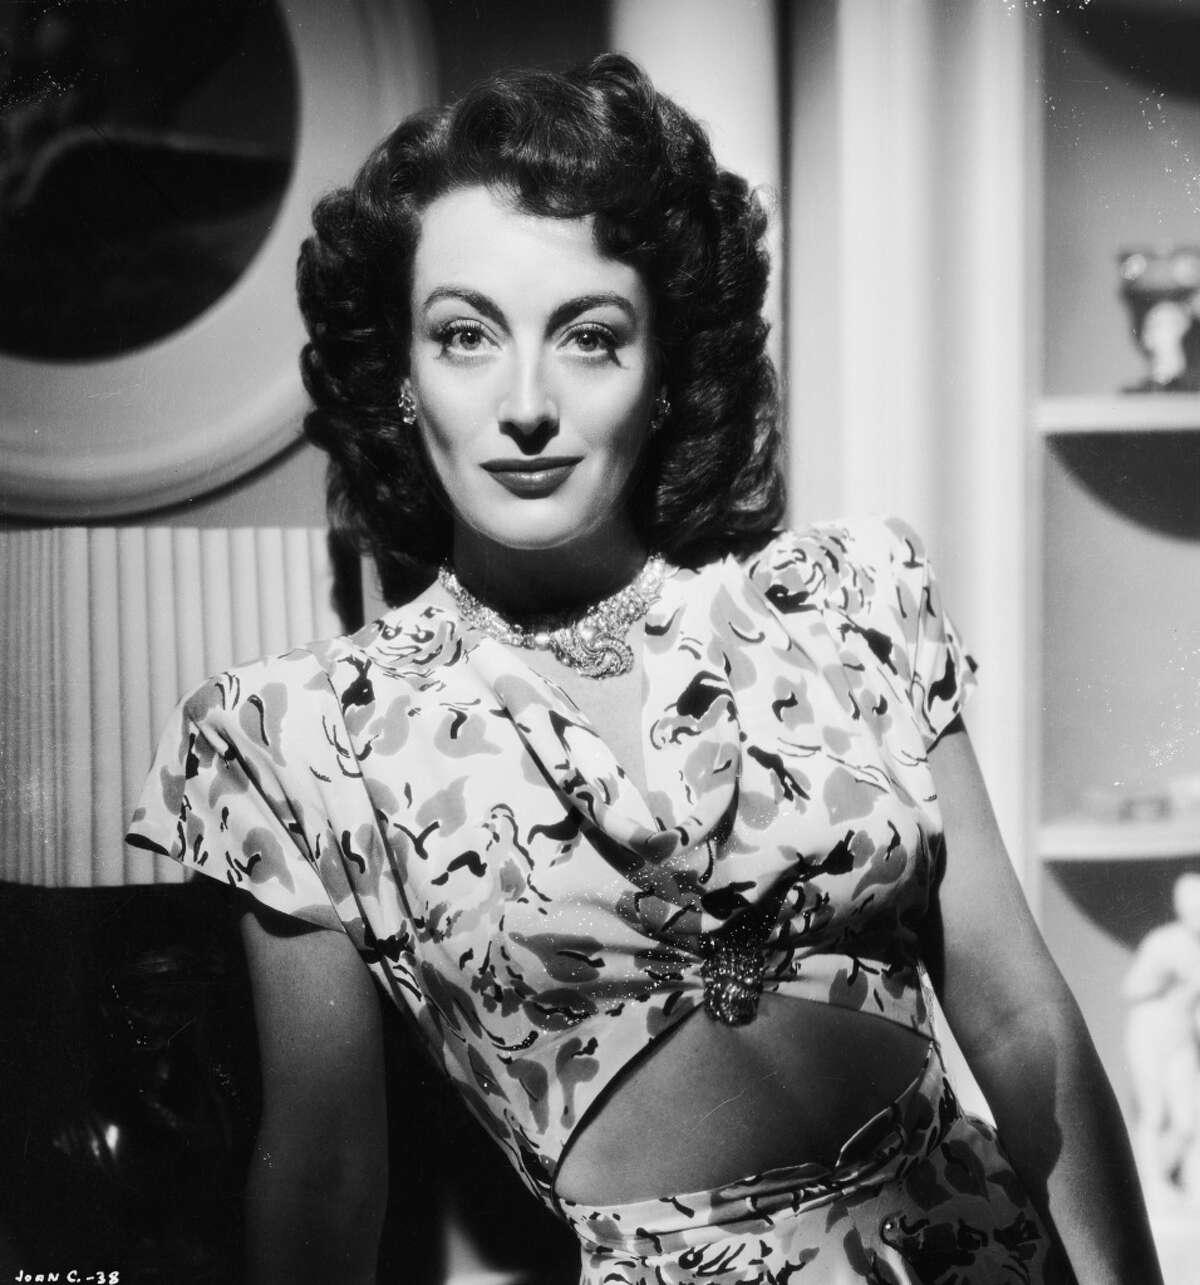 Joan Crawford, aka Lucille Fay LeSueur